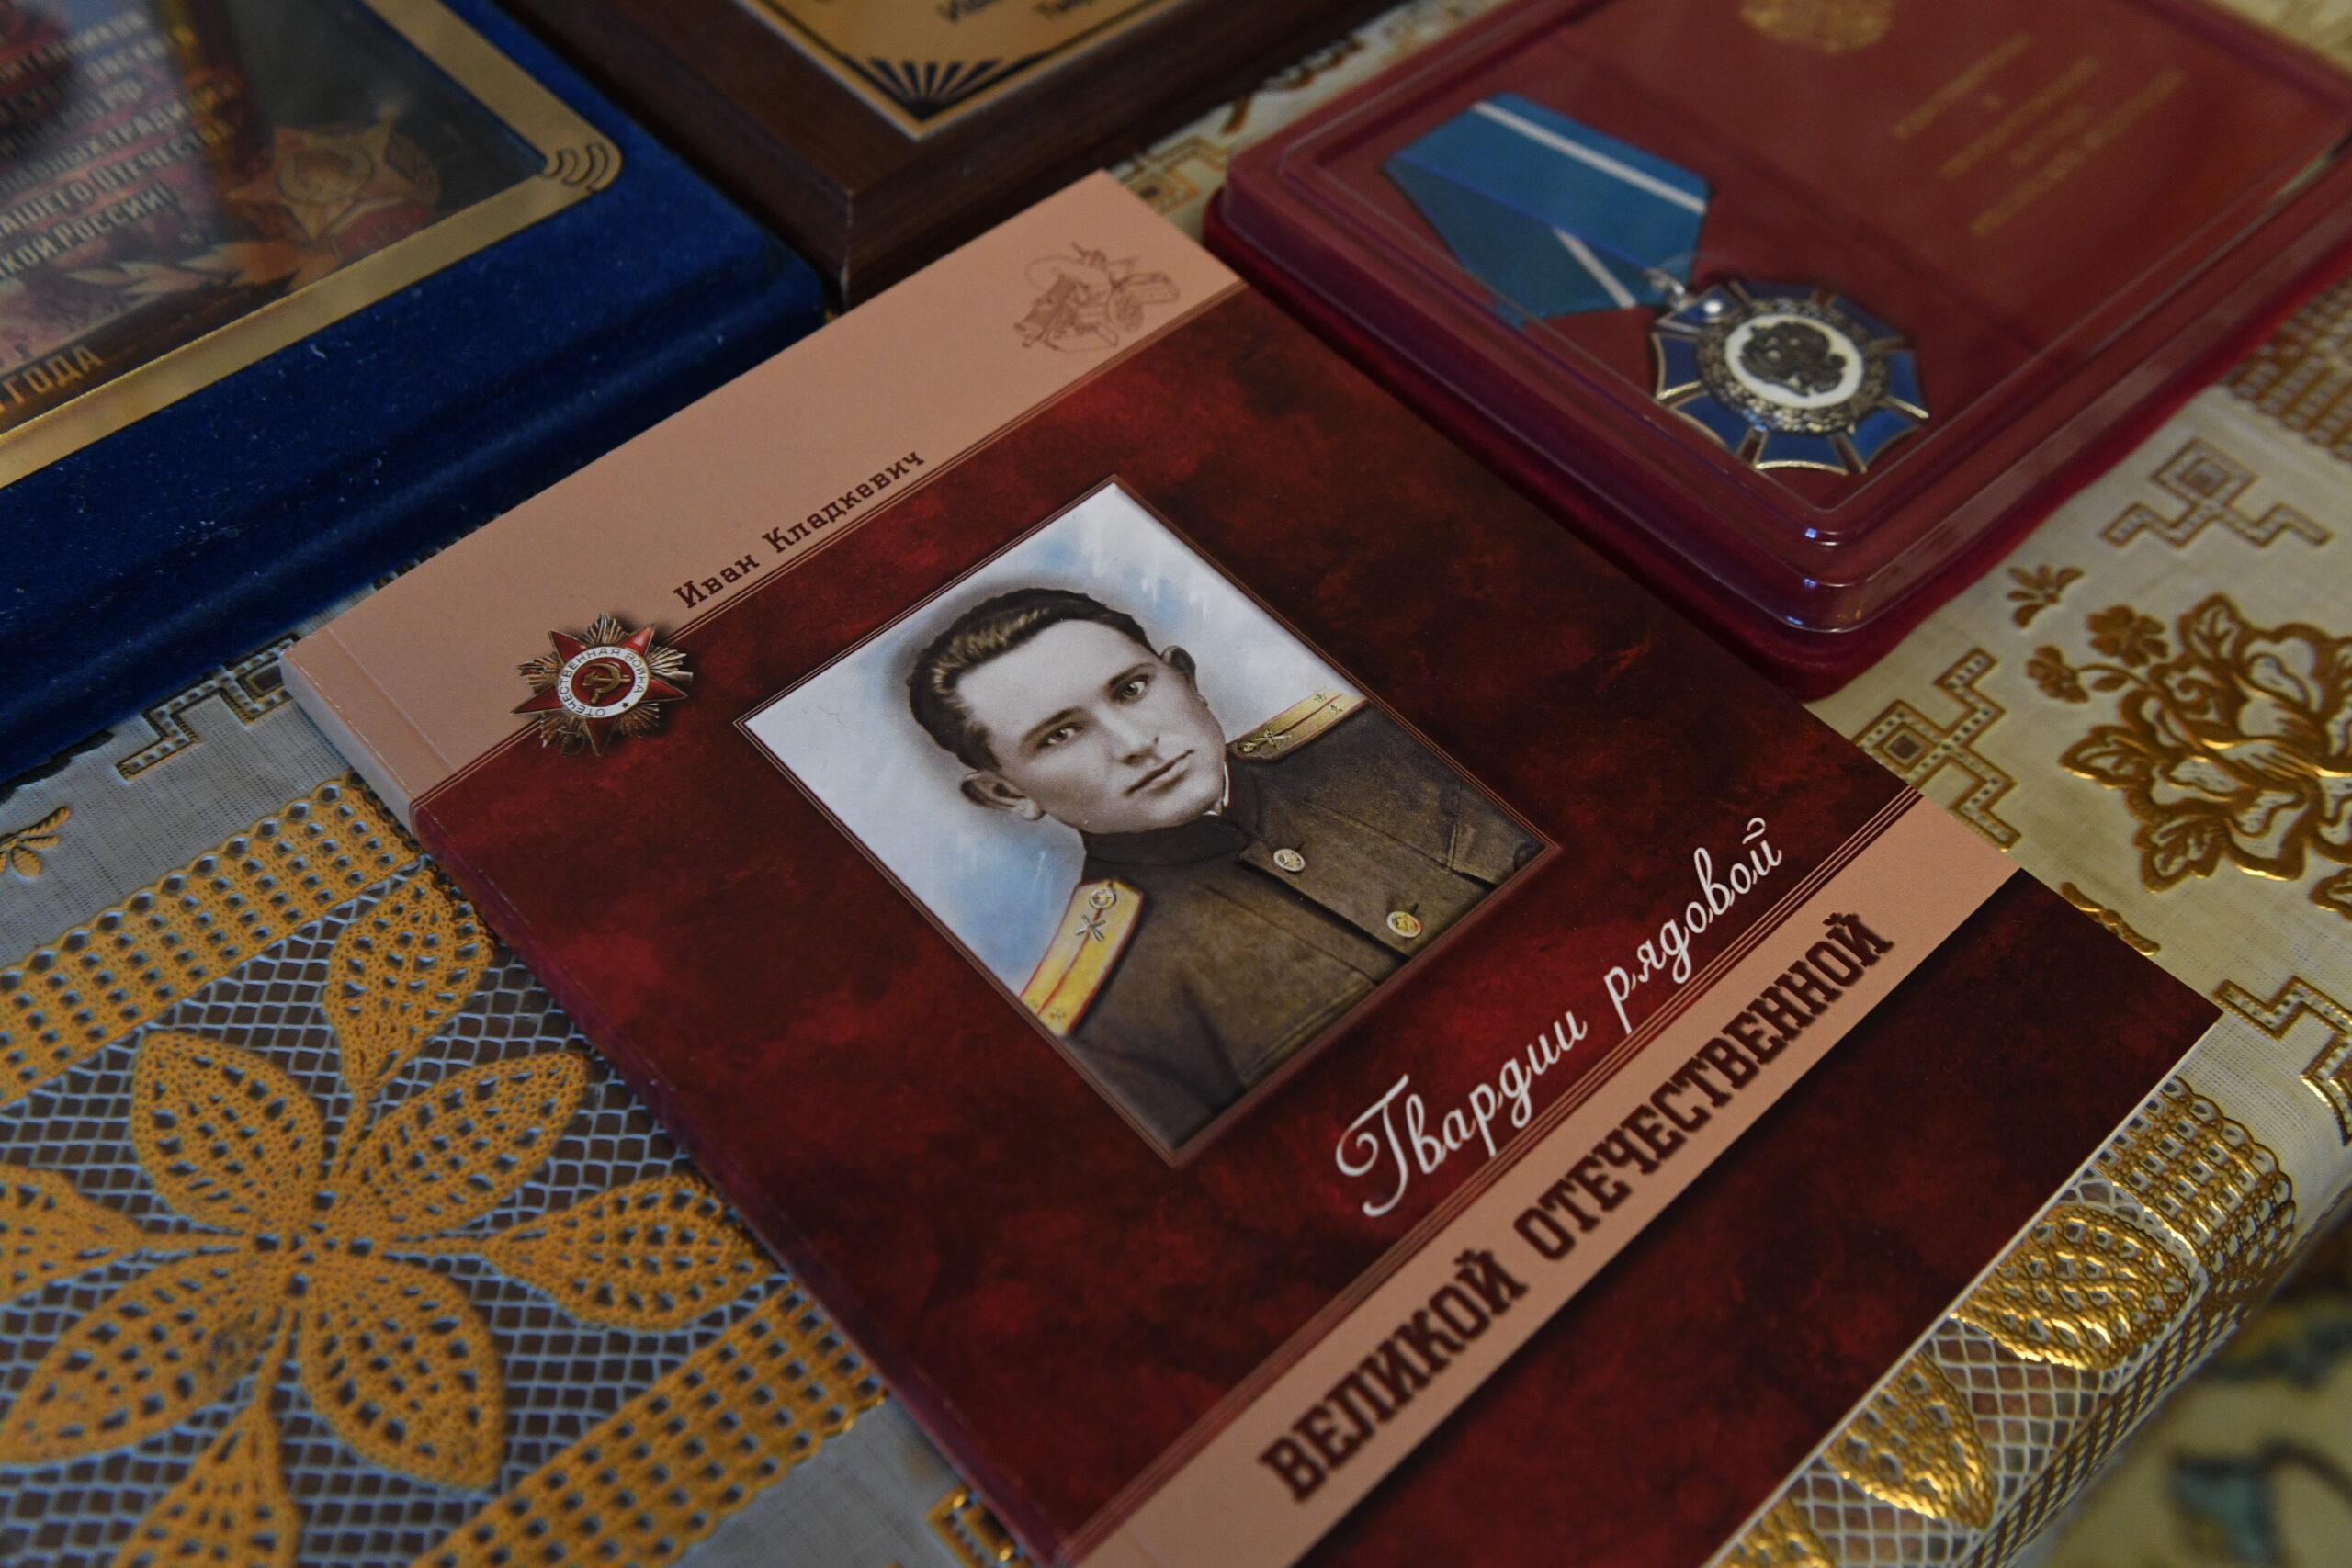 Фронтовик Иван Кладкевич представил свою книгу в Музее Калининского фронта